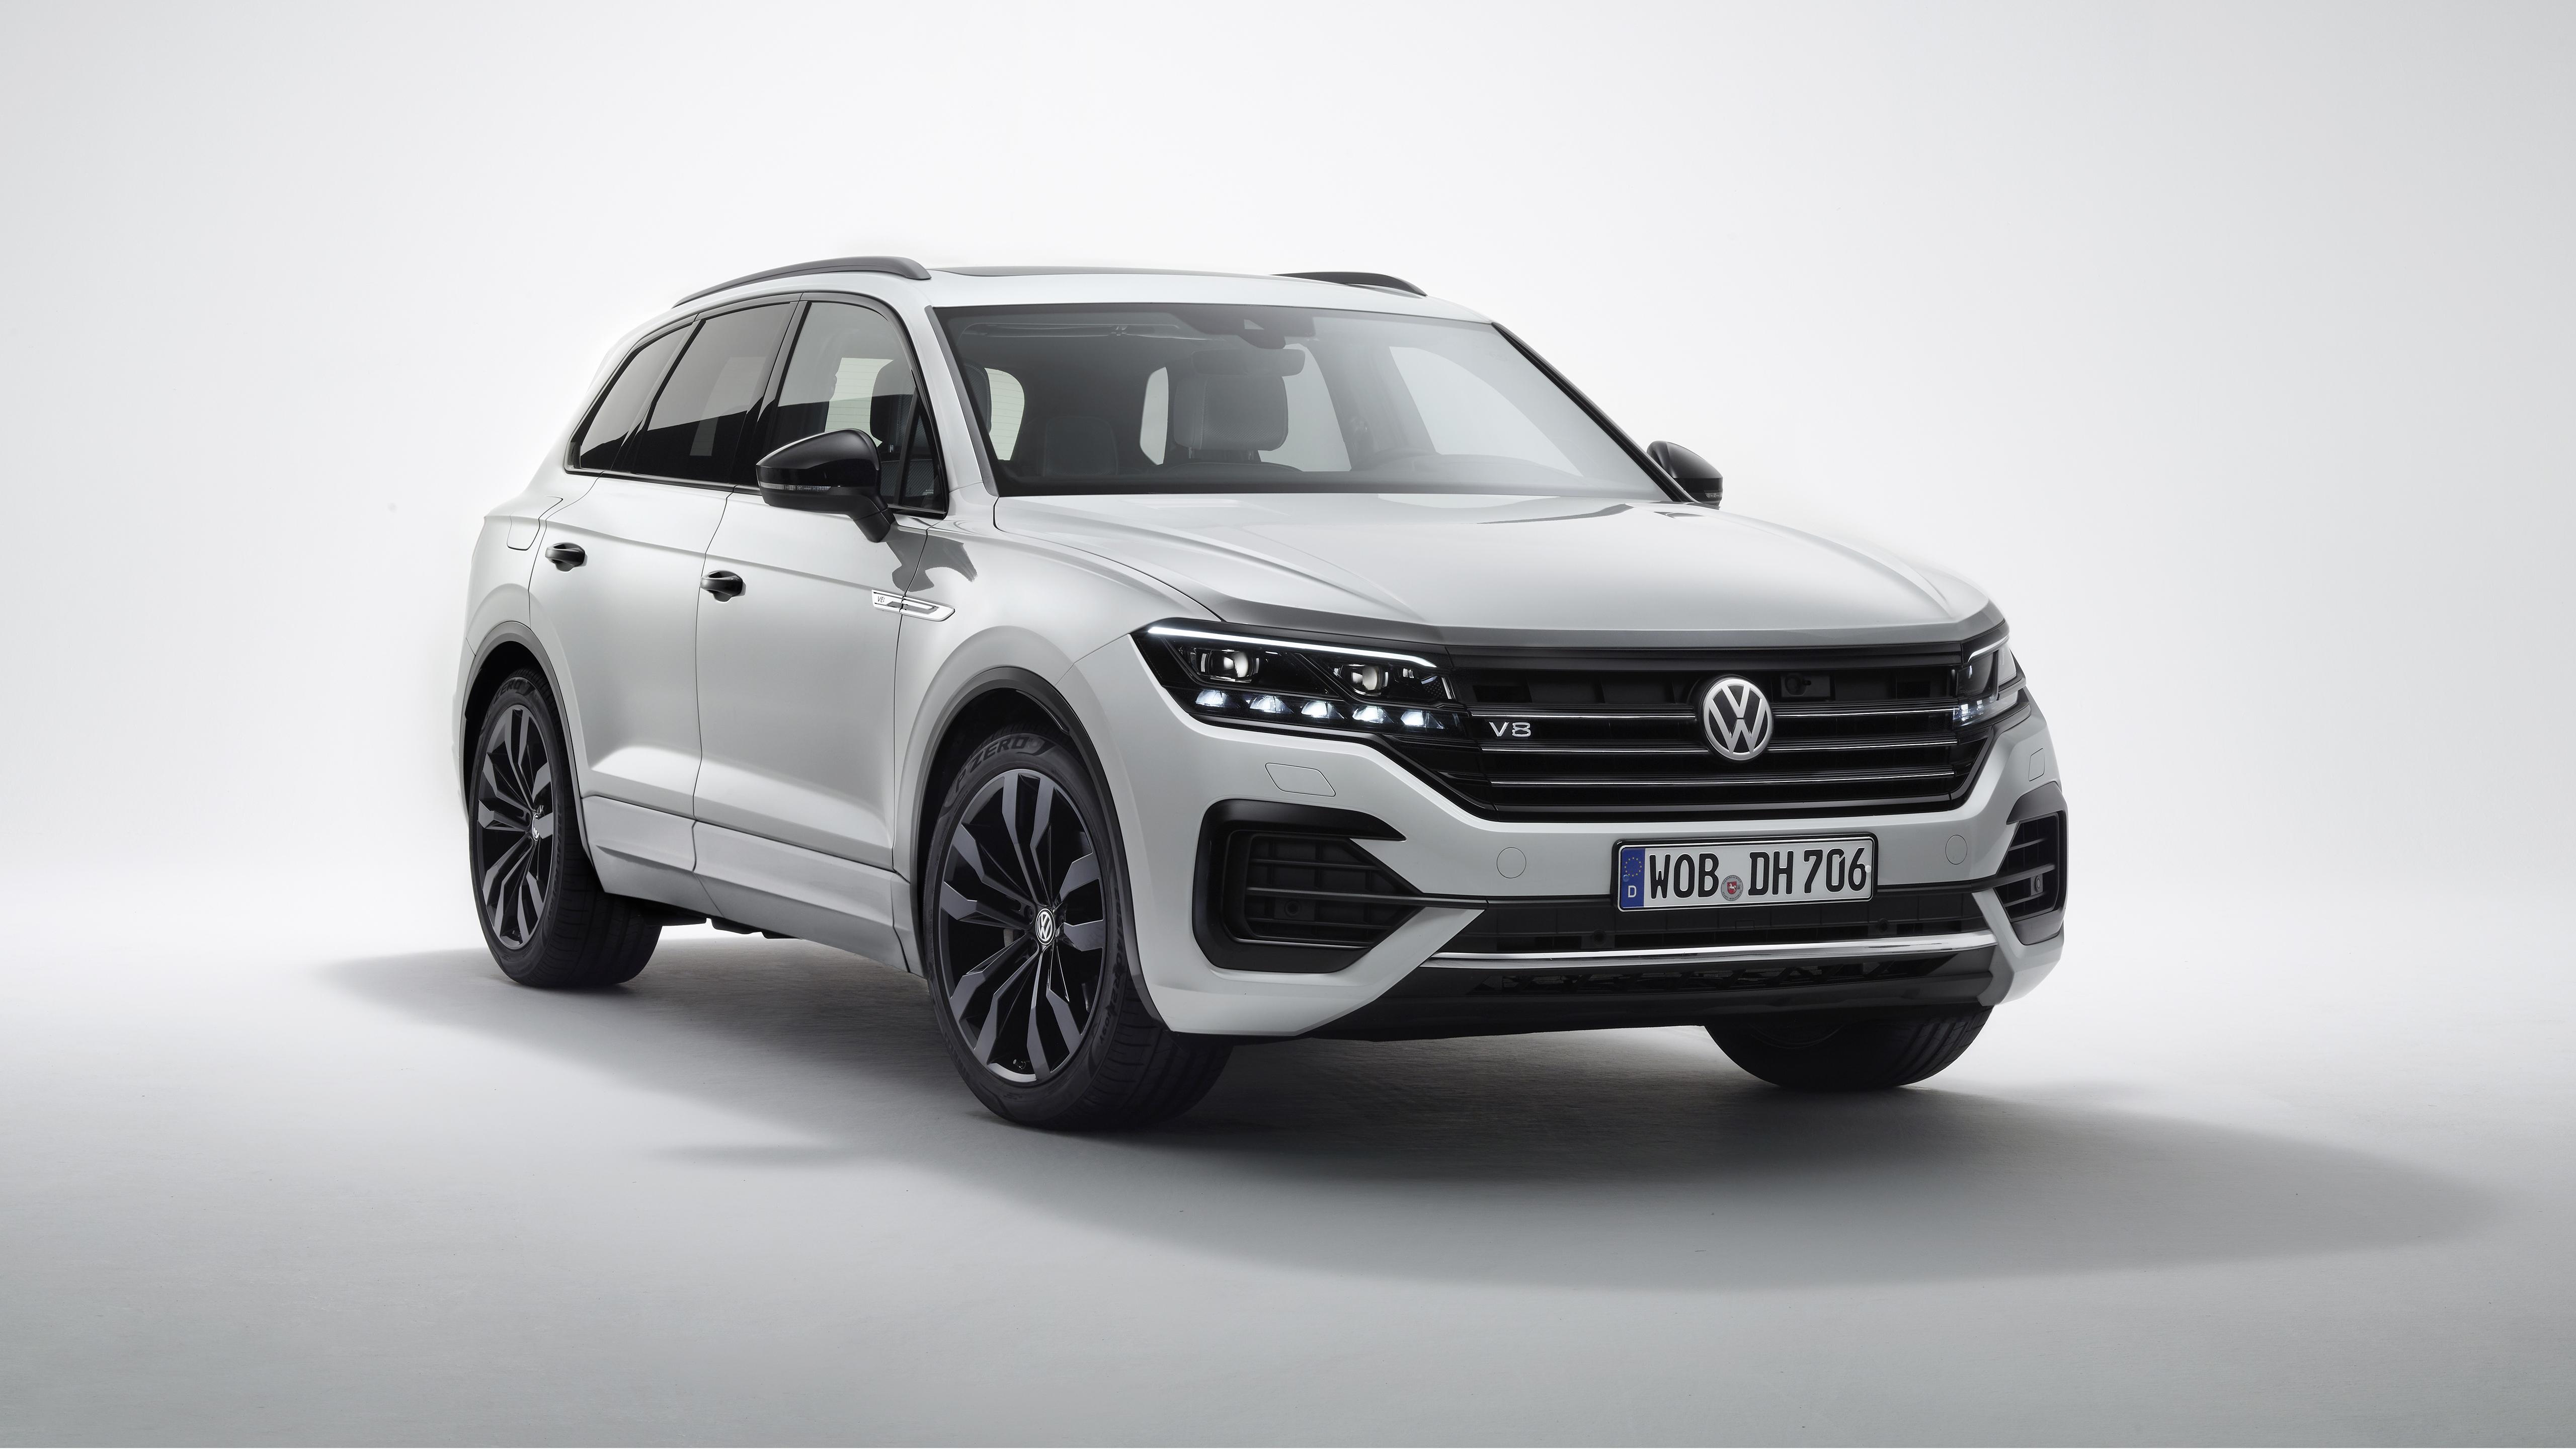 Volkswagen Touareg V8 TDI Last Edition 2020 5K Wallpaper ...